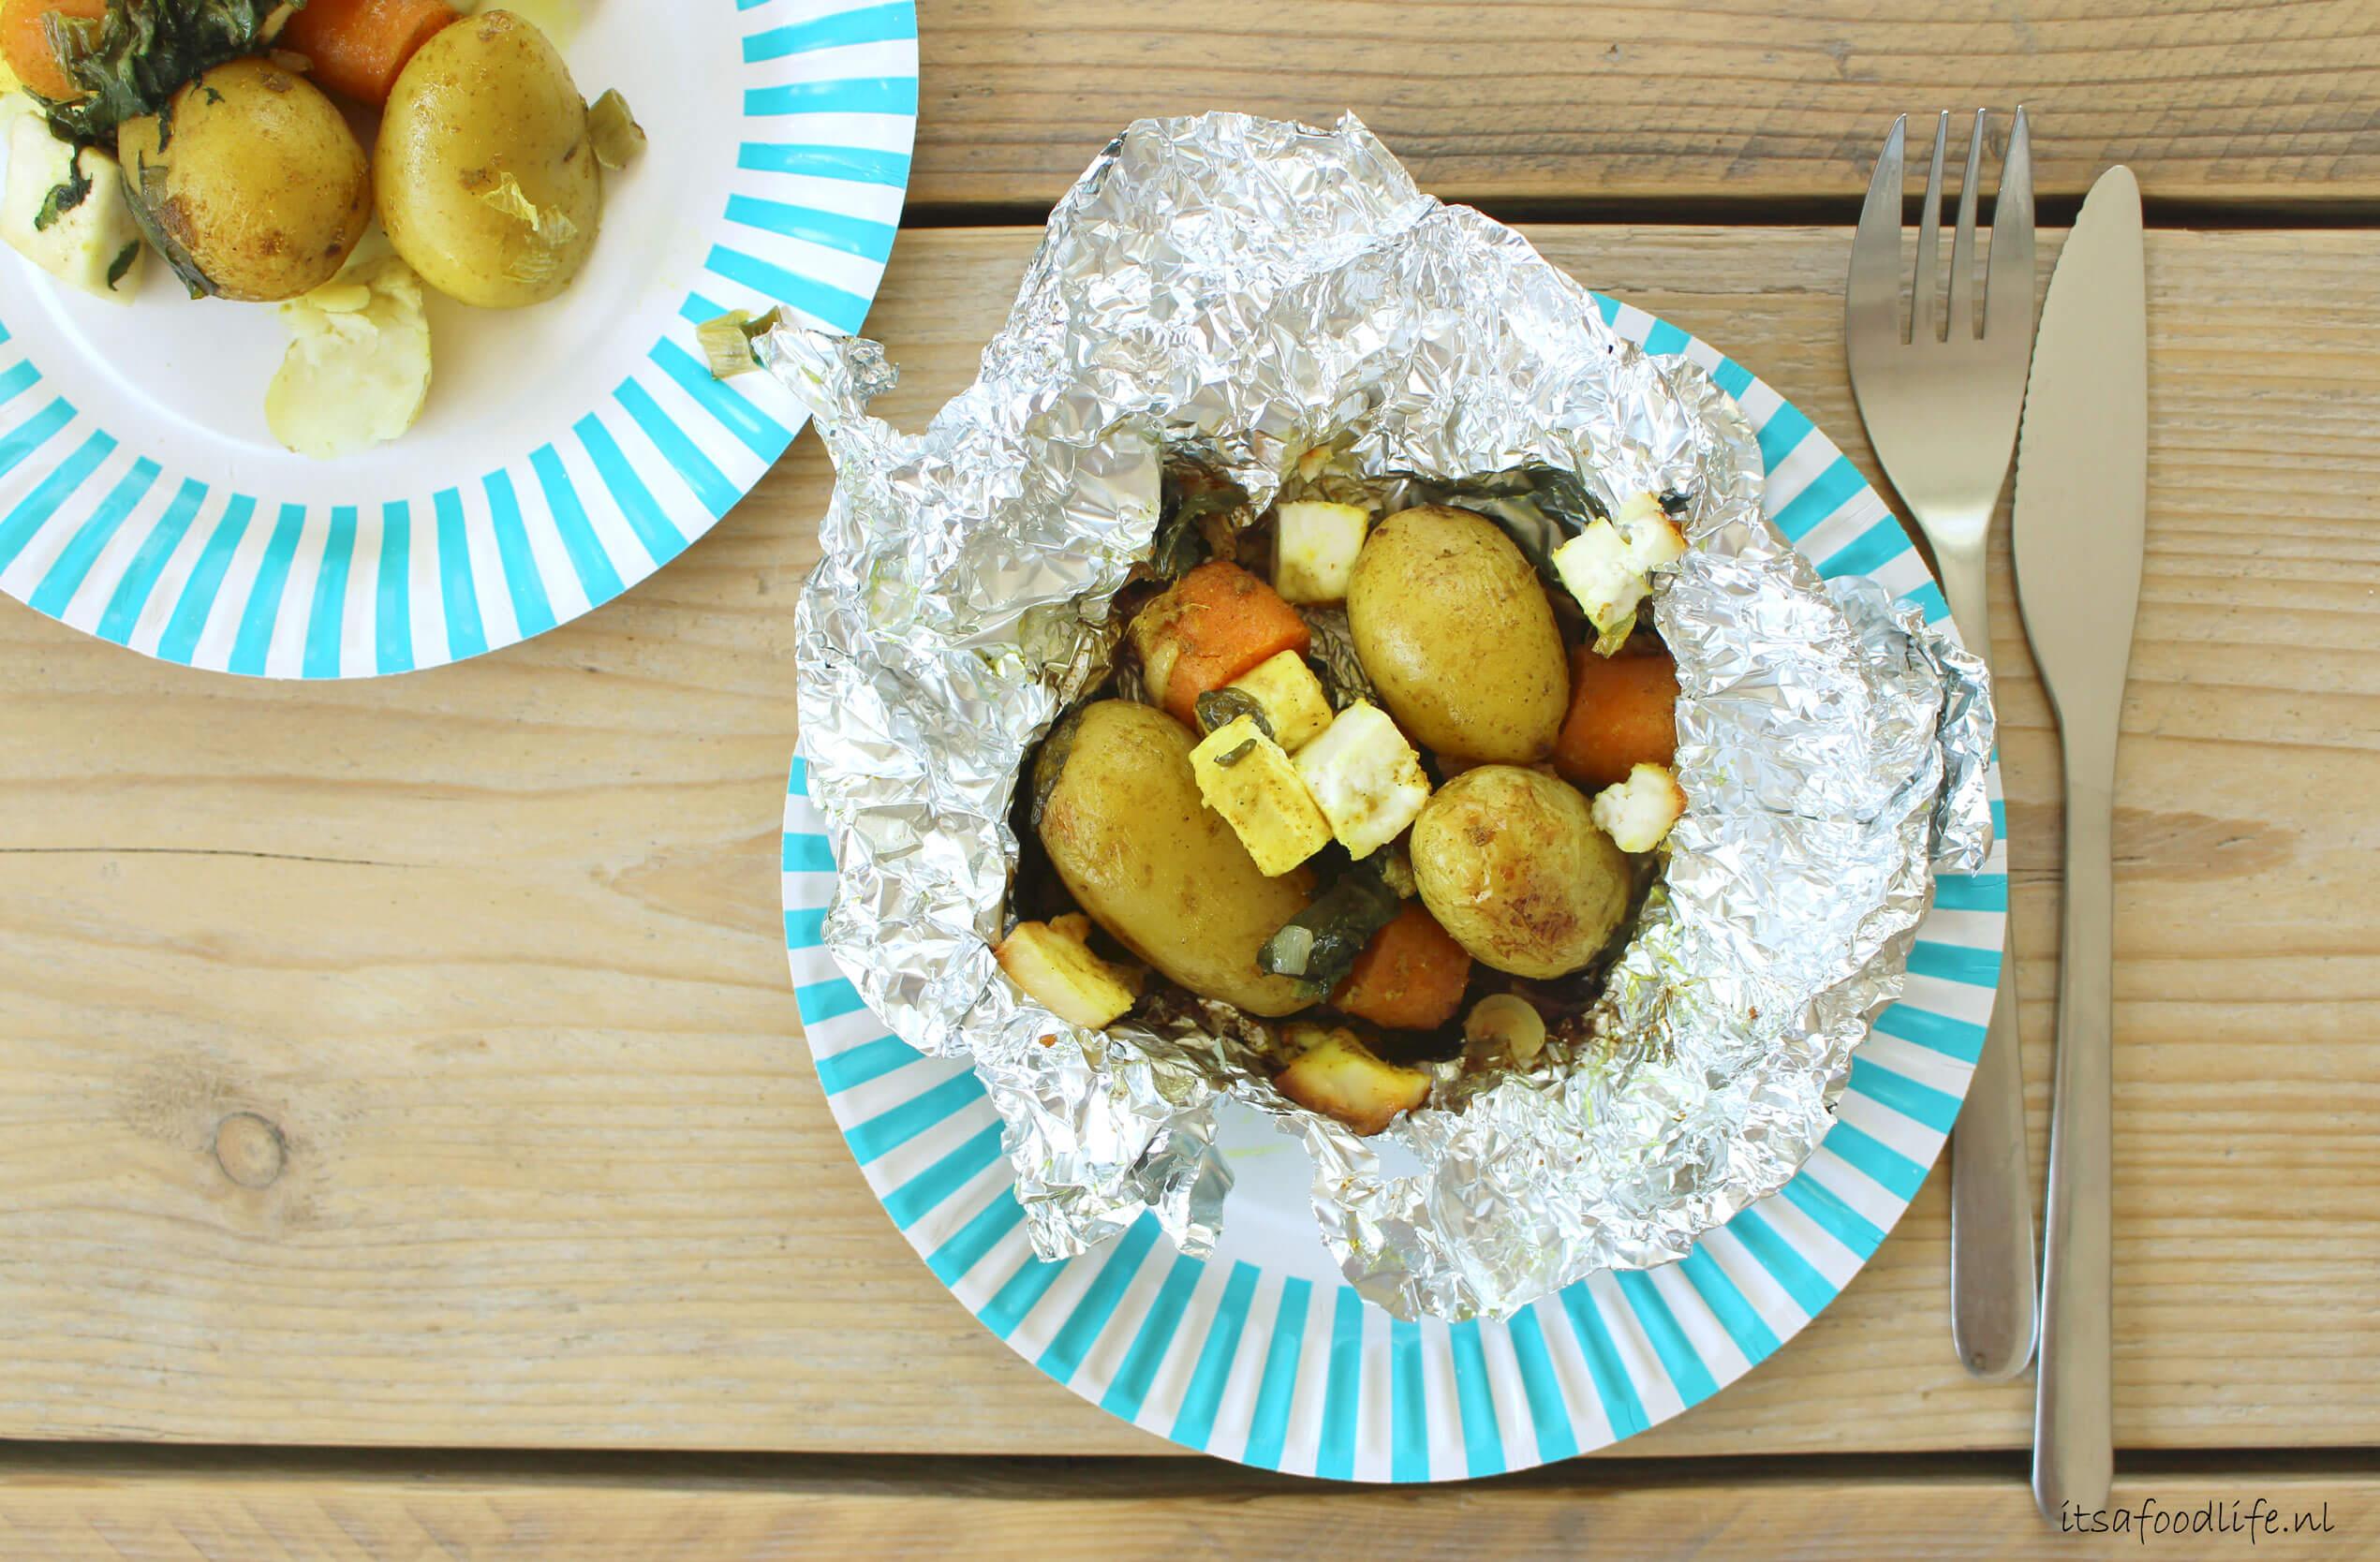 indiaas gevulde aardappelpakketjes. gepofte aardappels | It's a Food Life